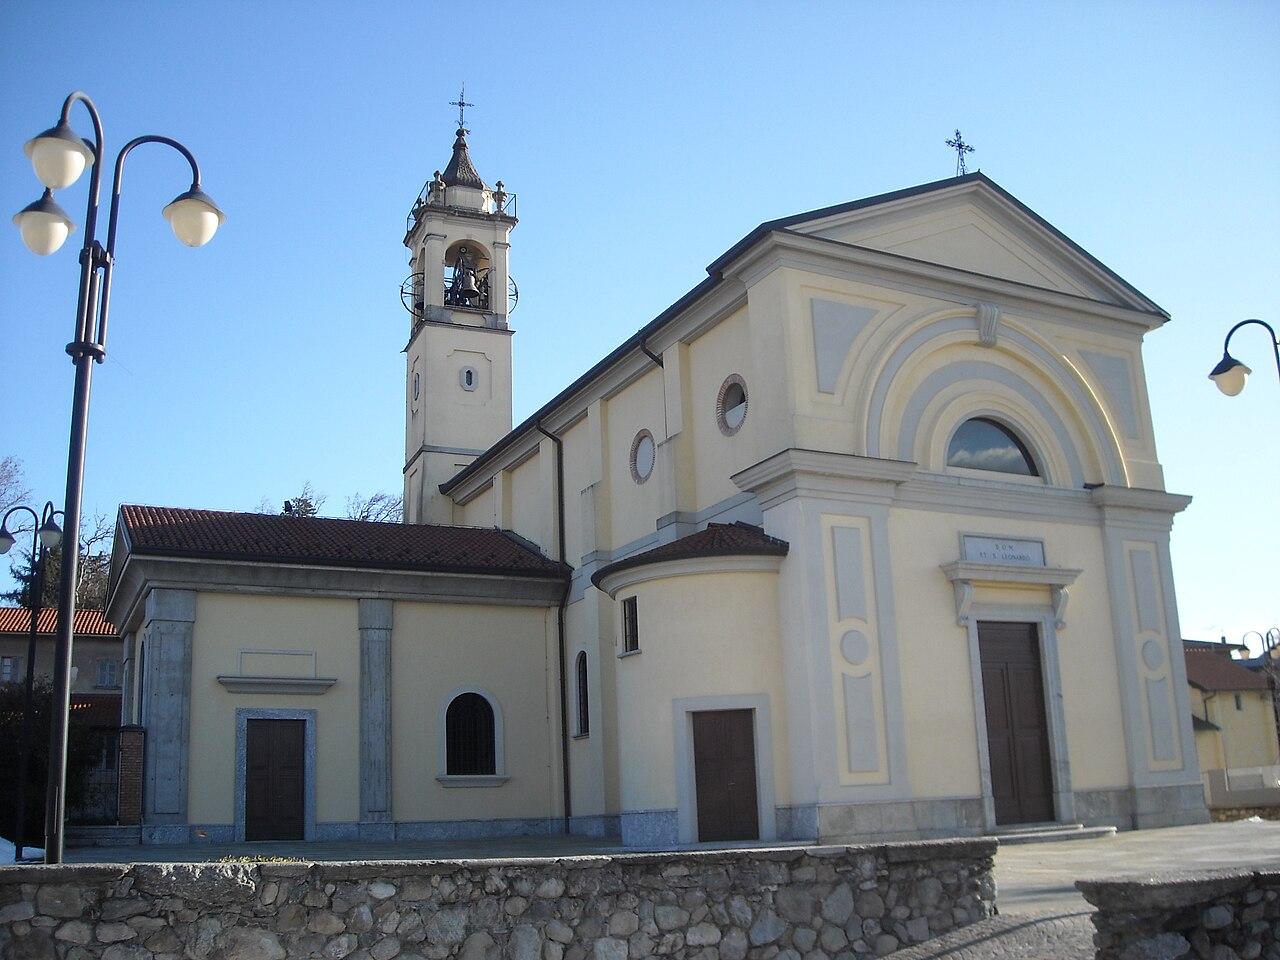 FileChiesa parrocchiale di San Leonardo Capiago